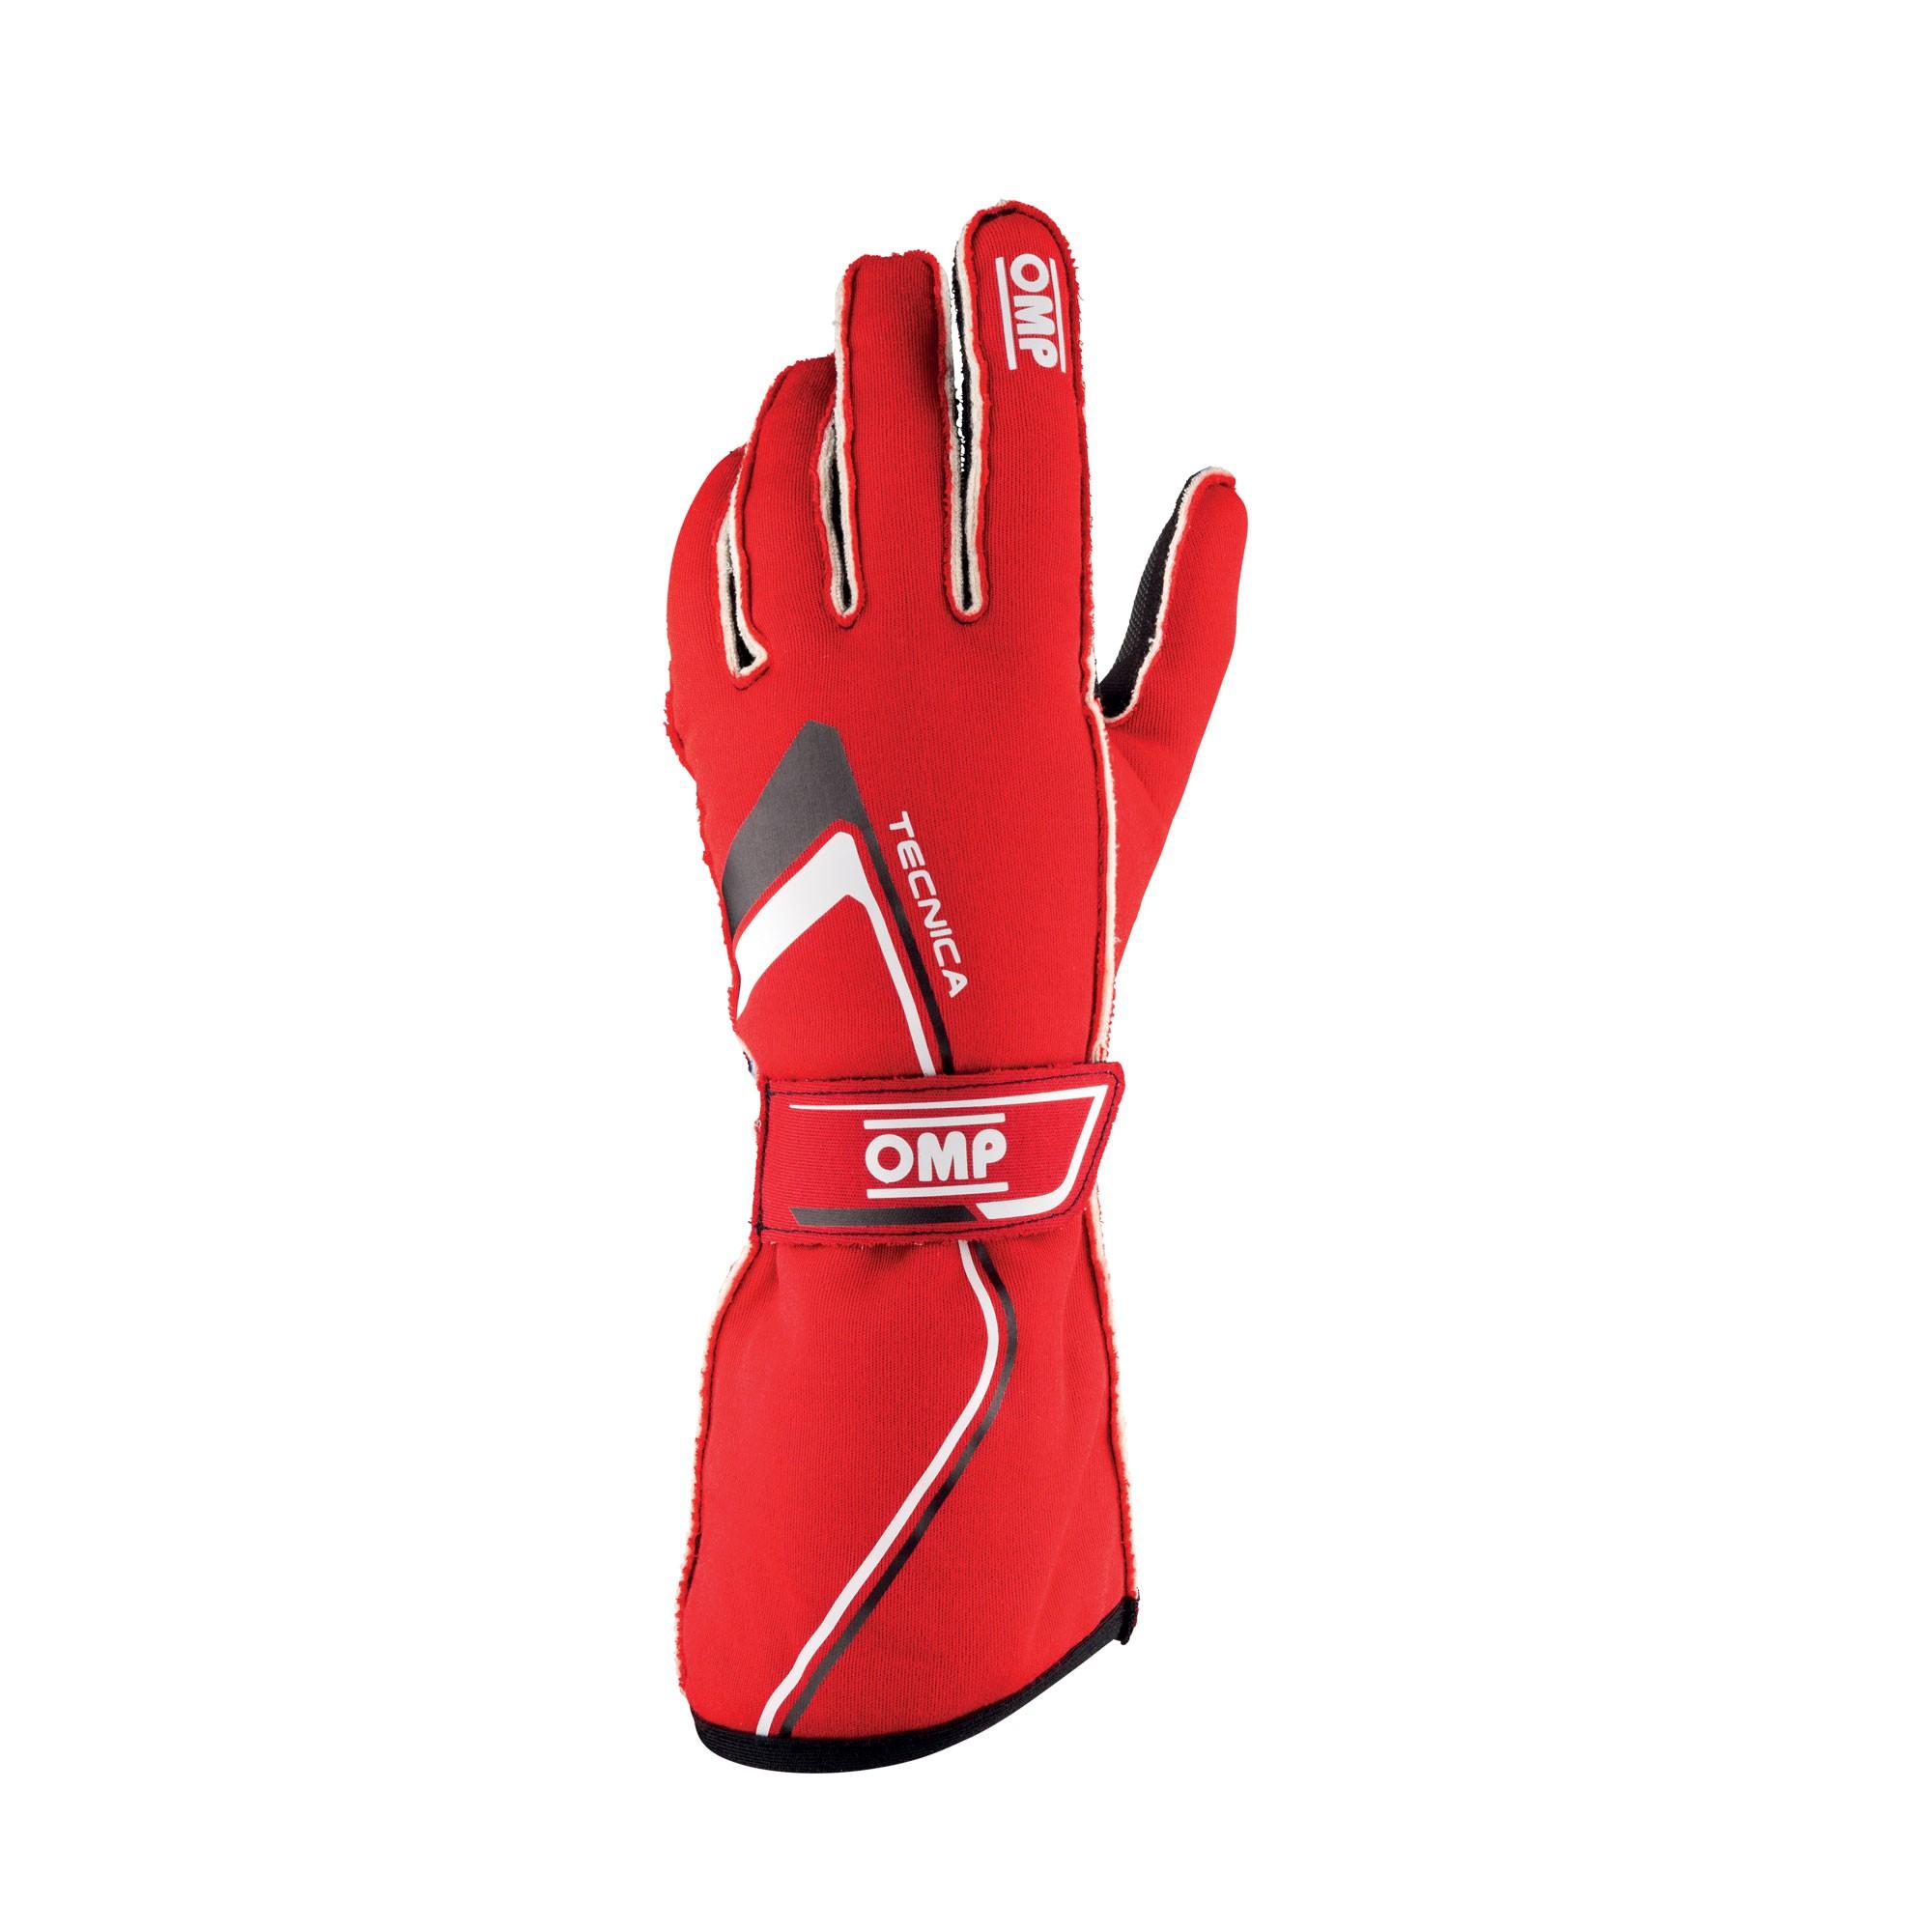 TECNICA Gloves my2021